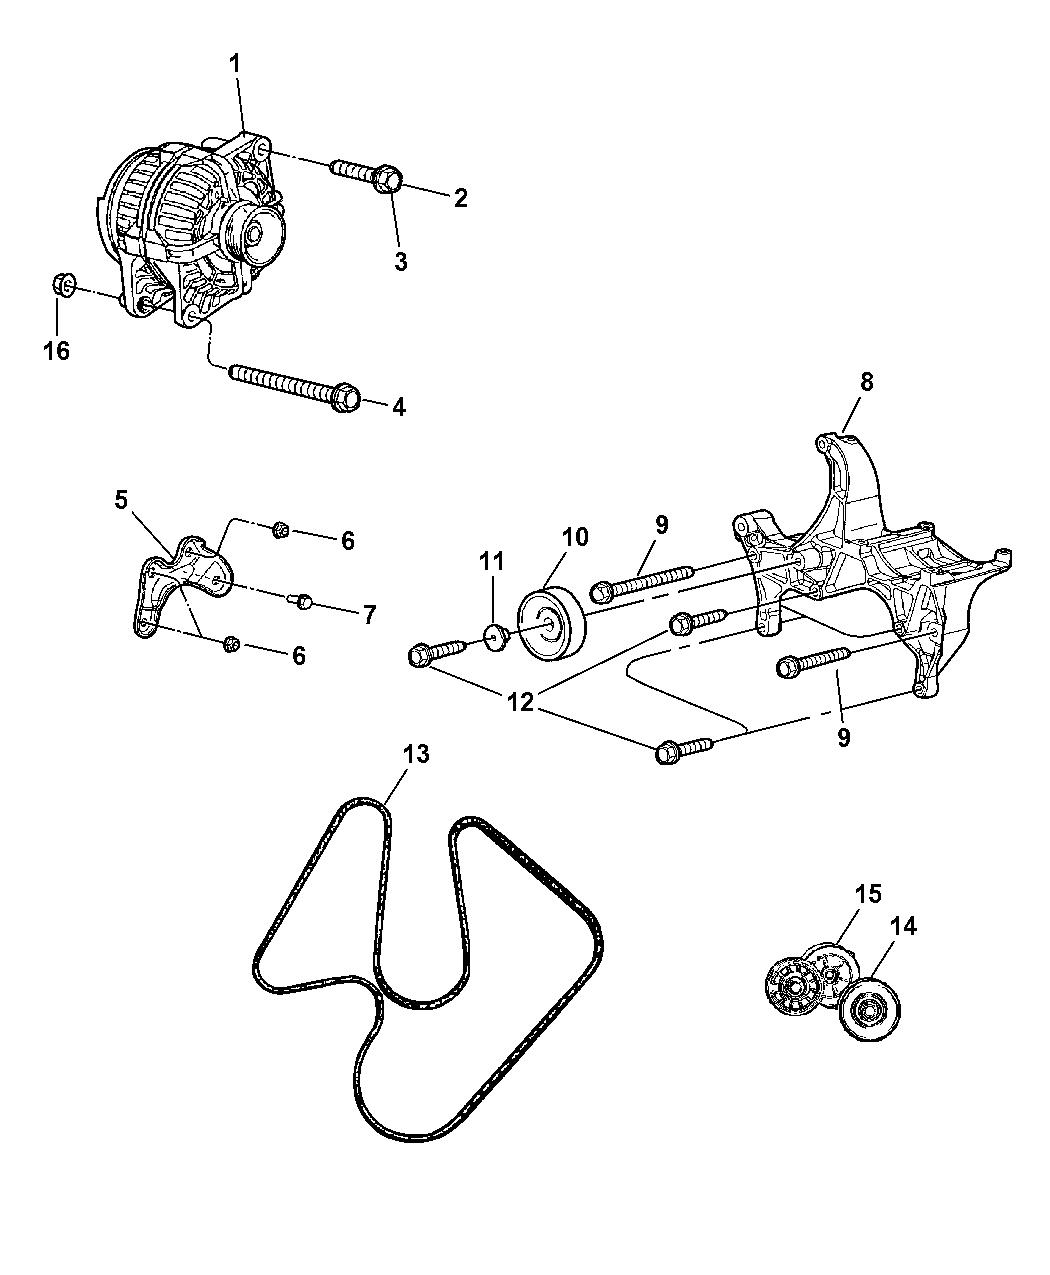 2007 Dodge Ram 1500 Serpentine Belt Routing Diagram Fixya